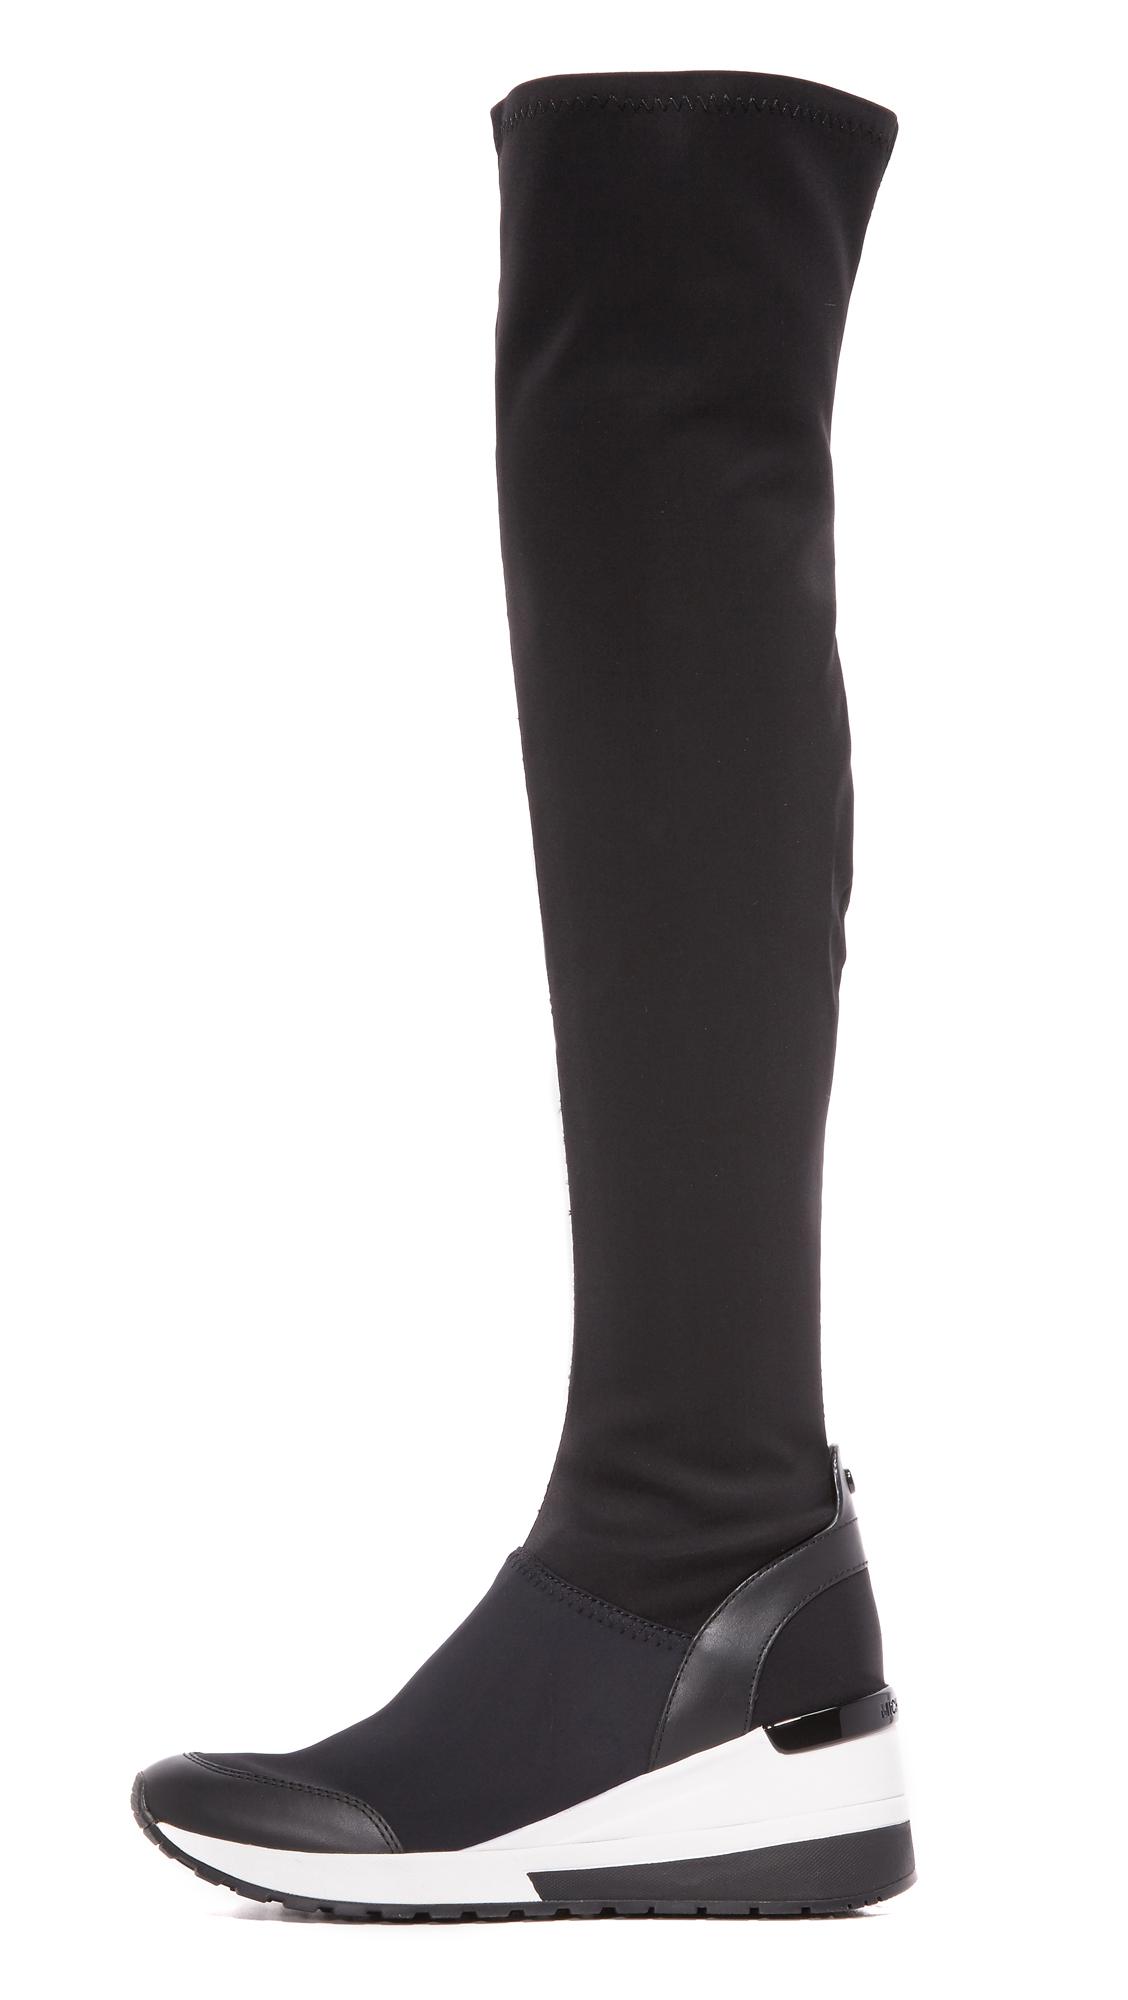 MICHAEL Michael Kors Neoprene Ace Sneaker Boots in Black